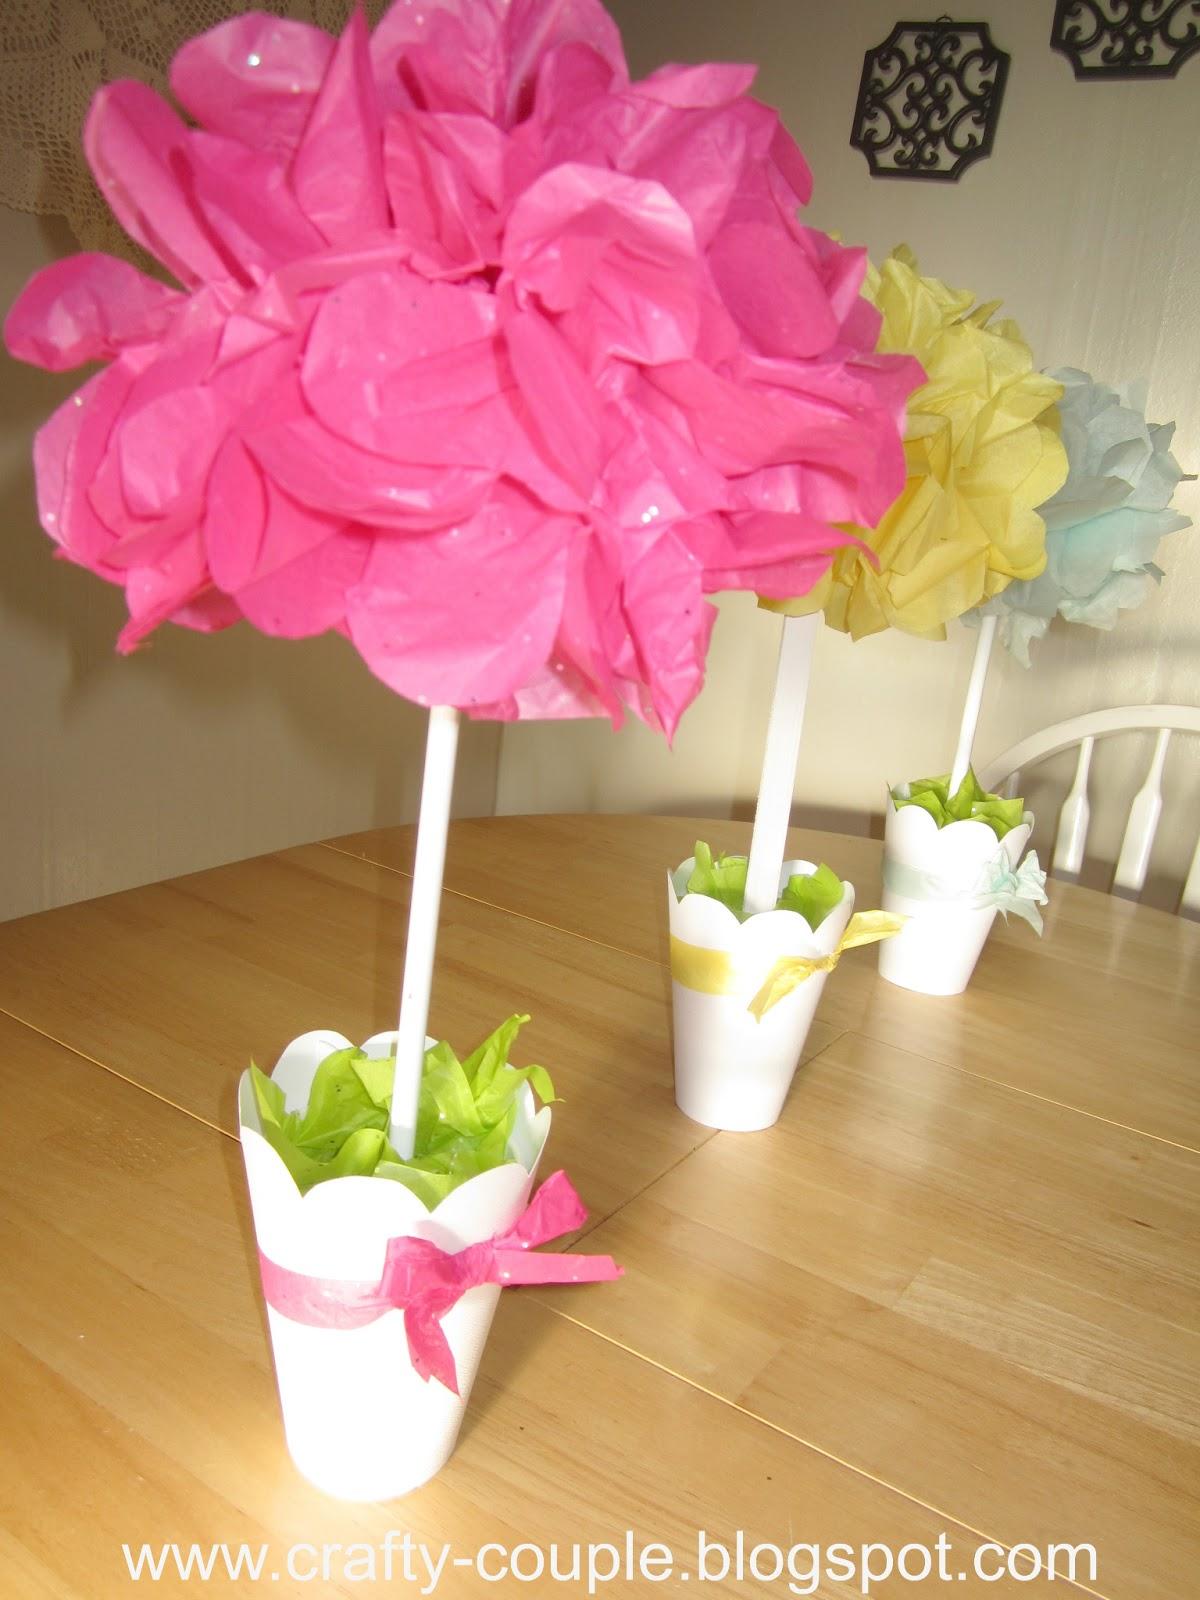 Crafty Couple Tissue Paper Pom Pom Topiary